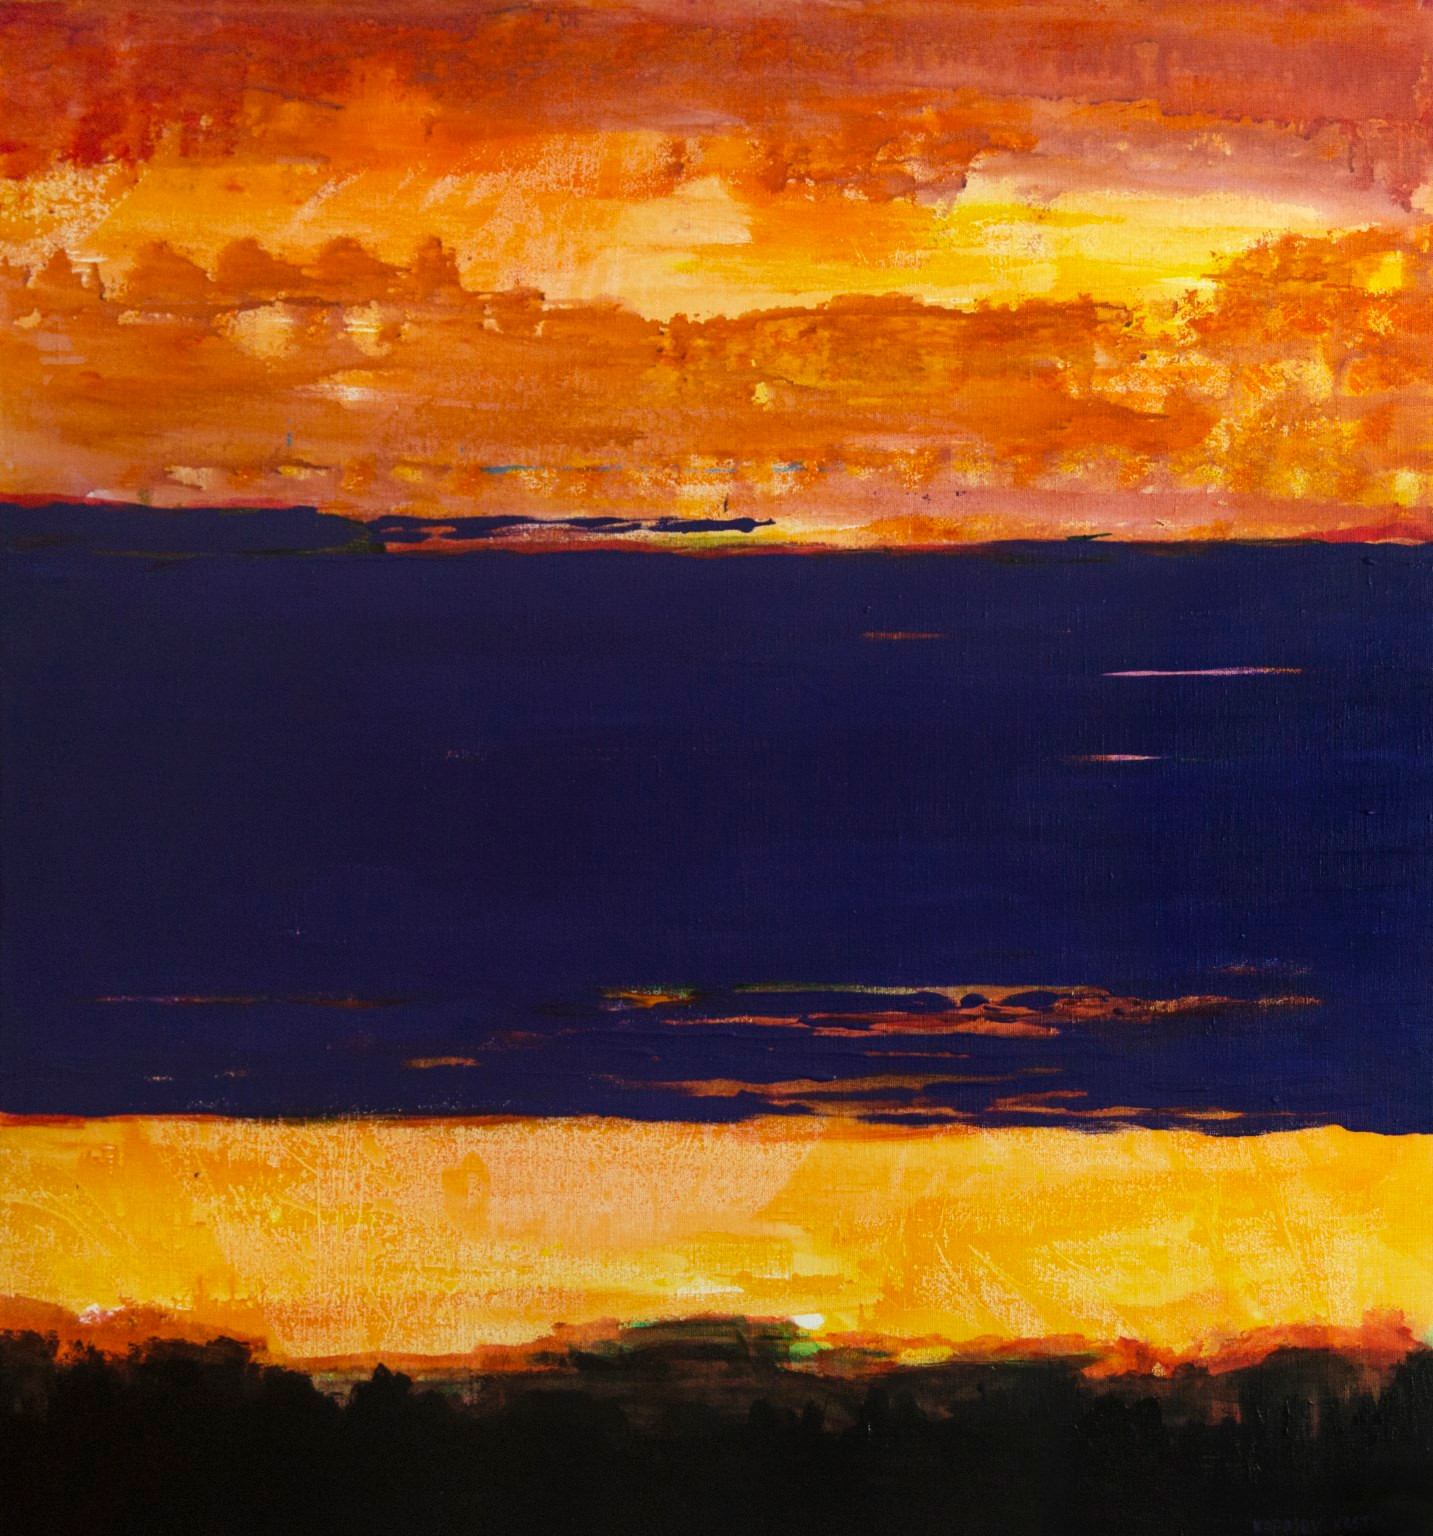 Фіолетова хмара, полотно, акрил, 110х115